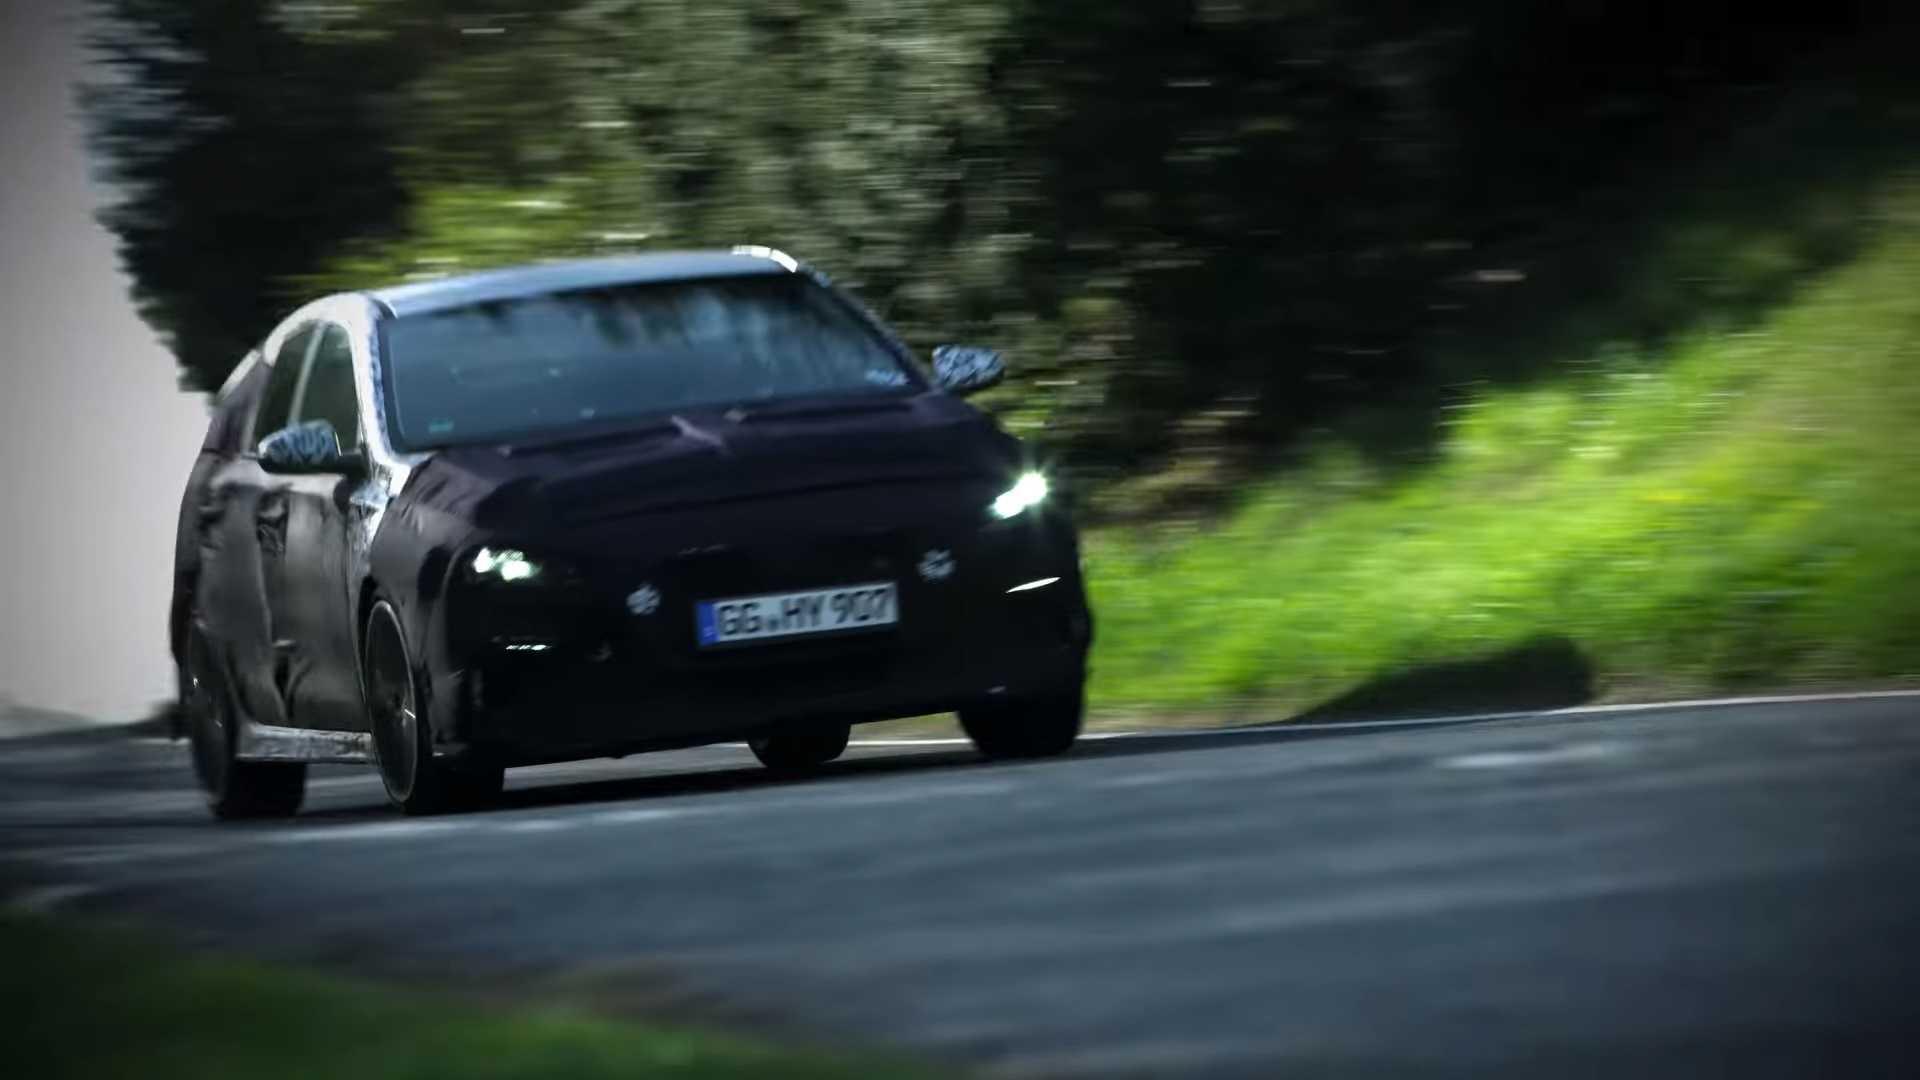 Simple 2018 Hyundai I30 N Hot Hatch Tested On UK39s Twisty Roads